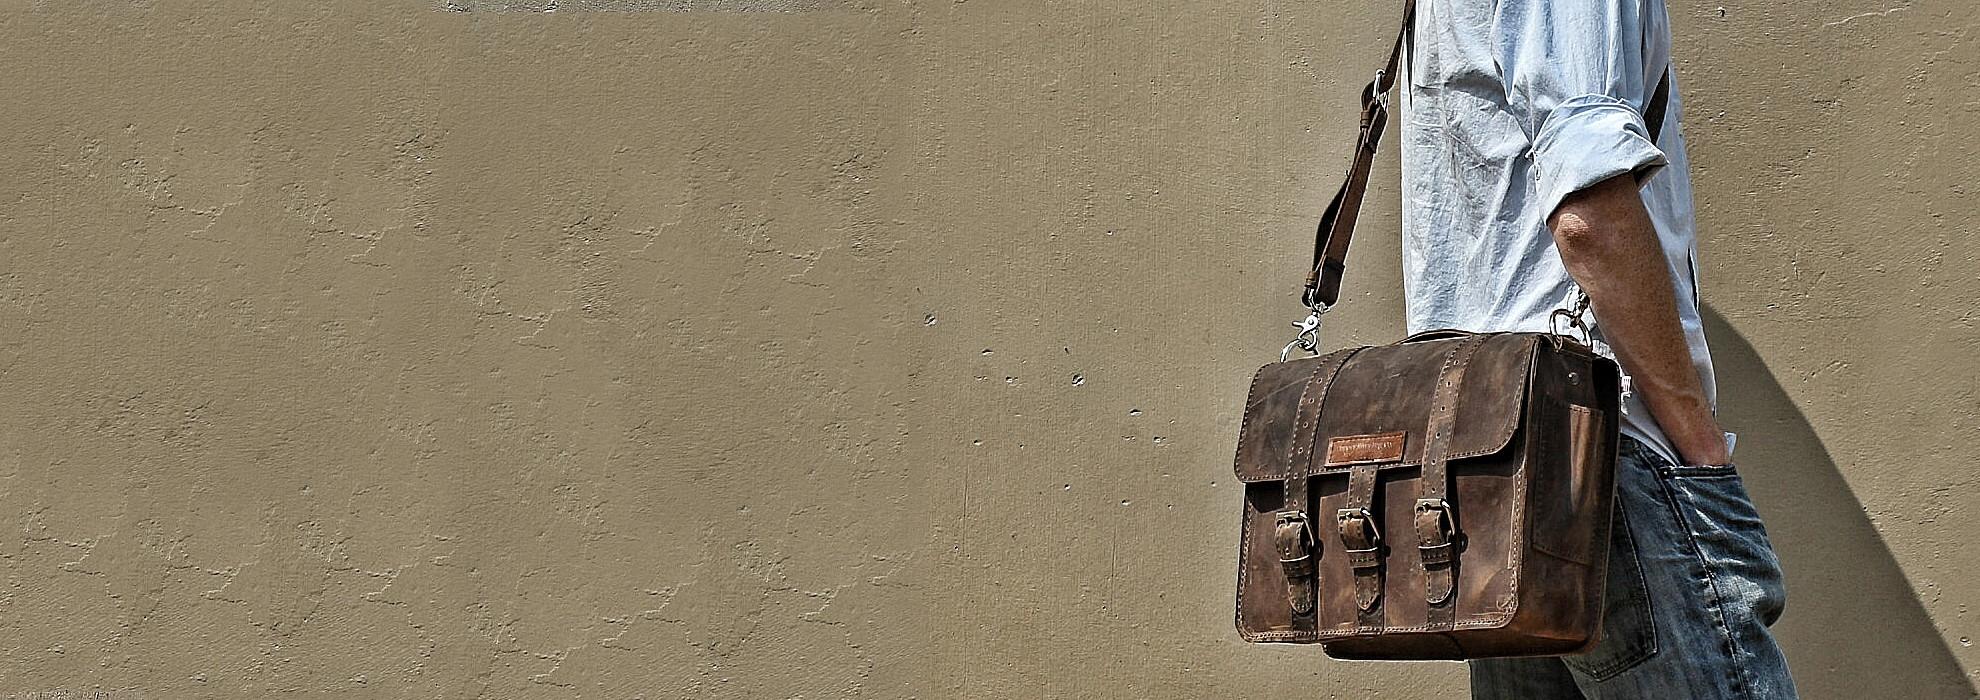 copper-river-bag-co-banner-14.jpg